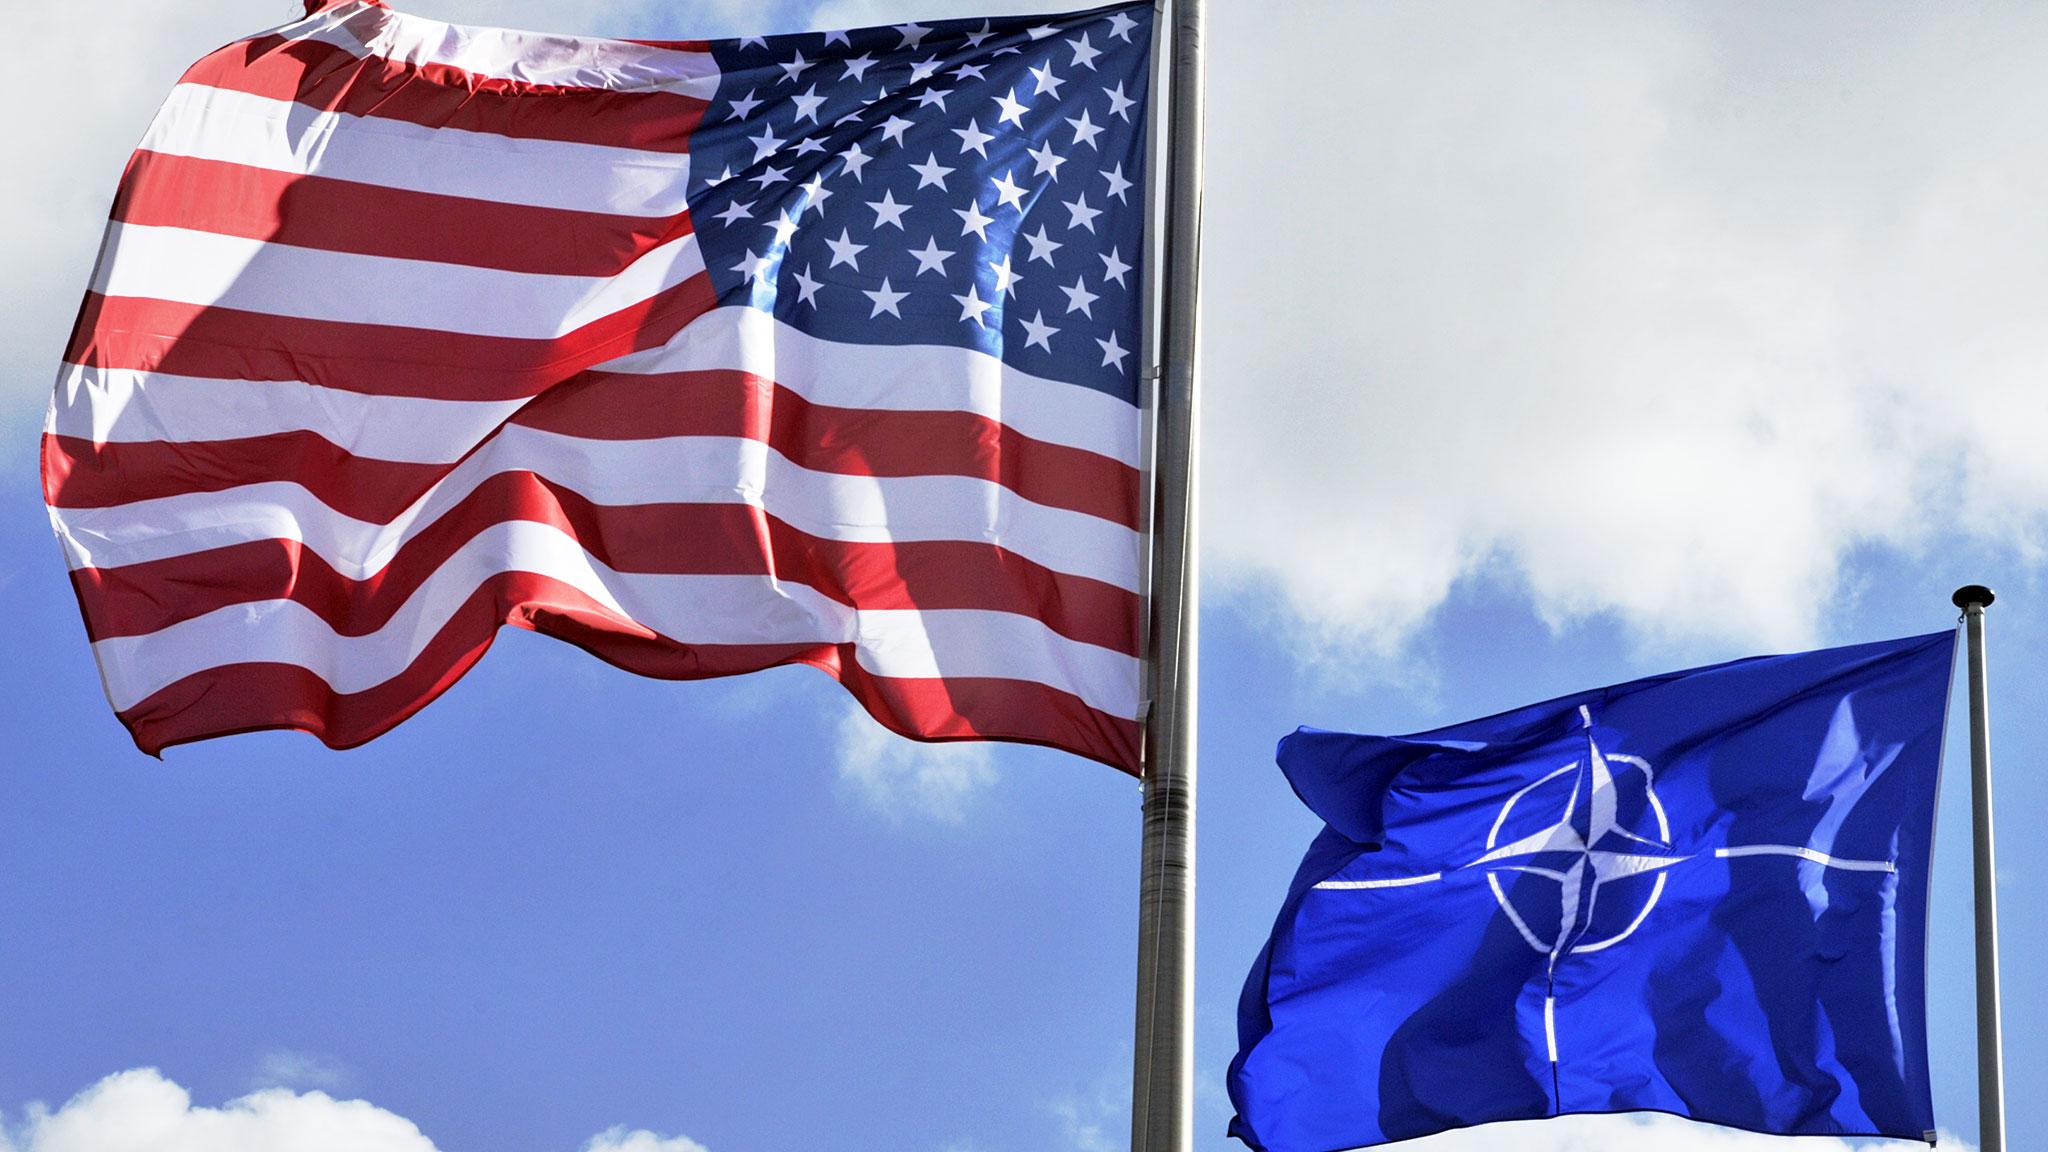 https://russia-now.com/wp-content/uploads/2017/02/NATO_USA.jpg